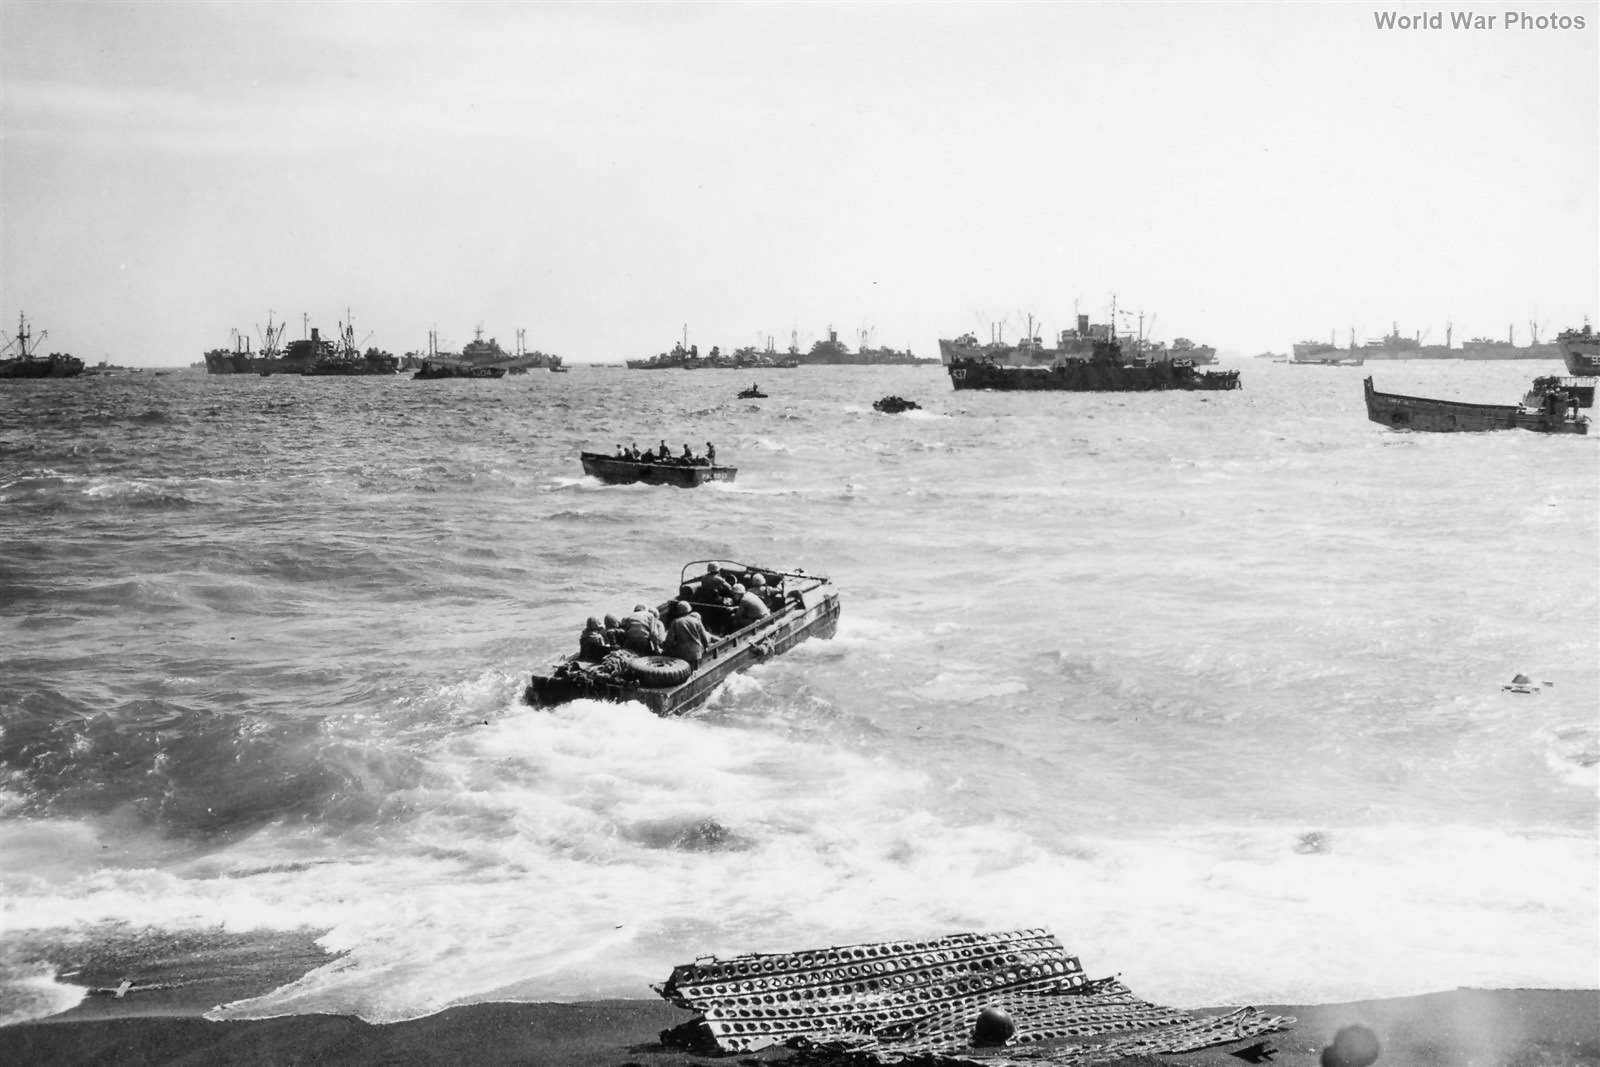 Marine DUKW off Iwo Jima Beach